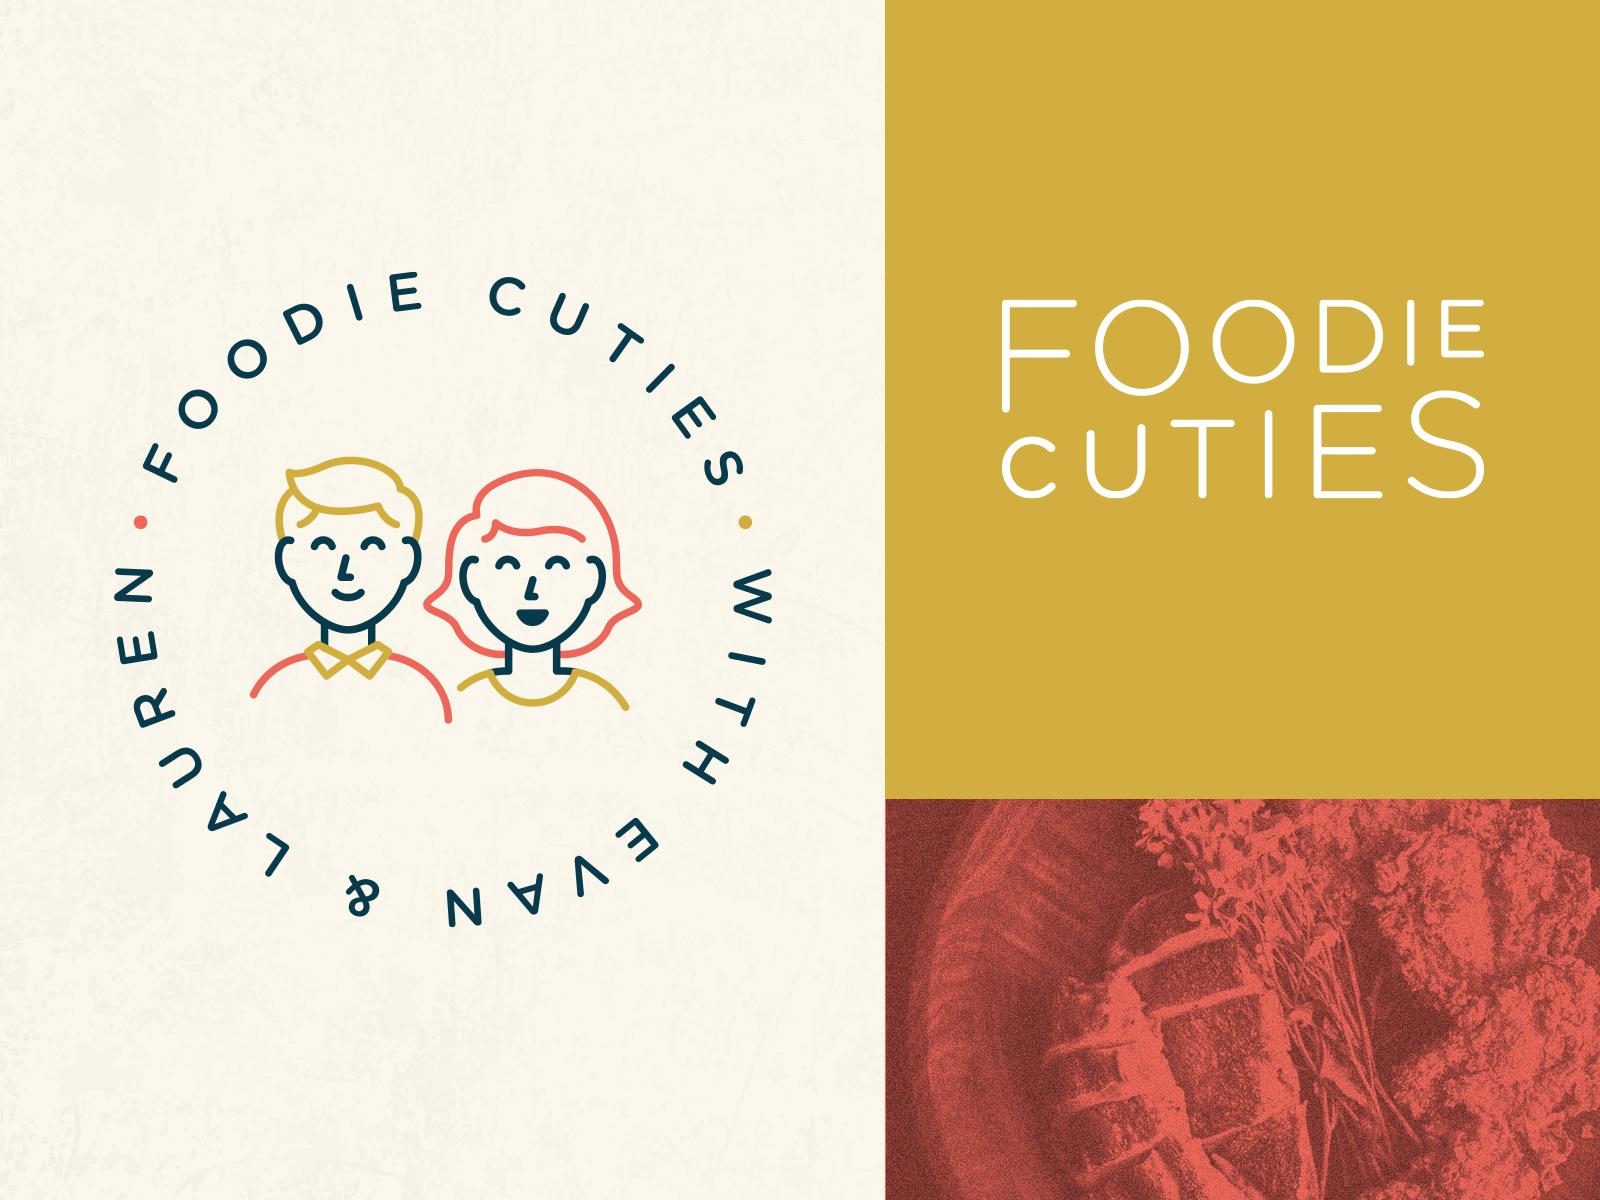 Foodiecutiesdribbble3